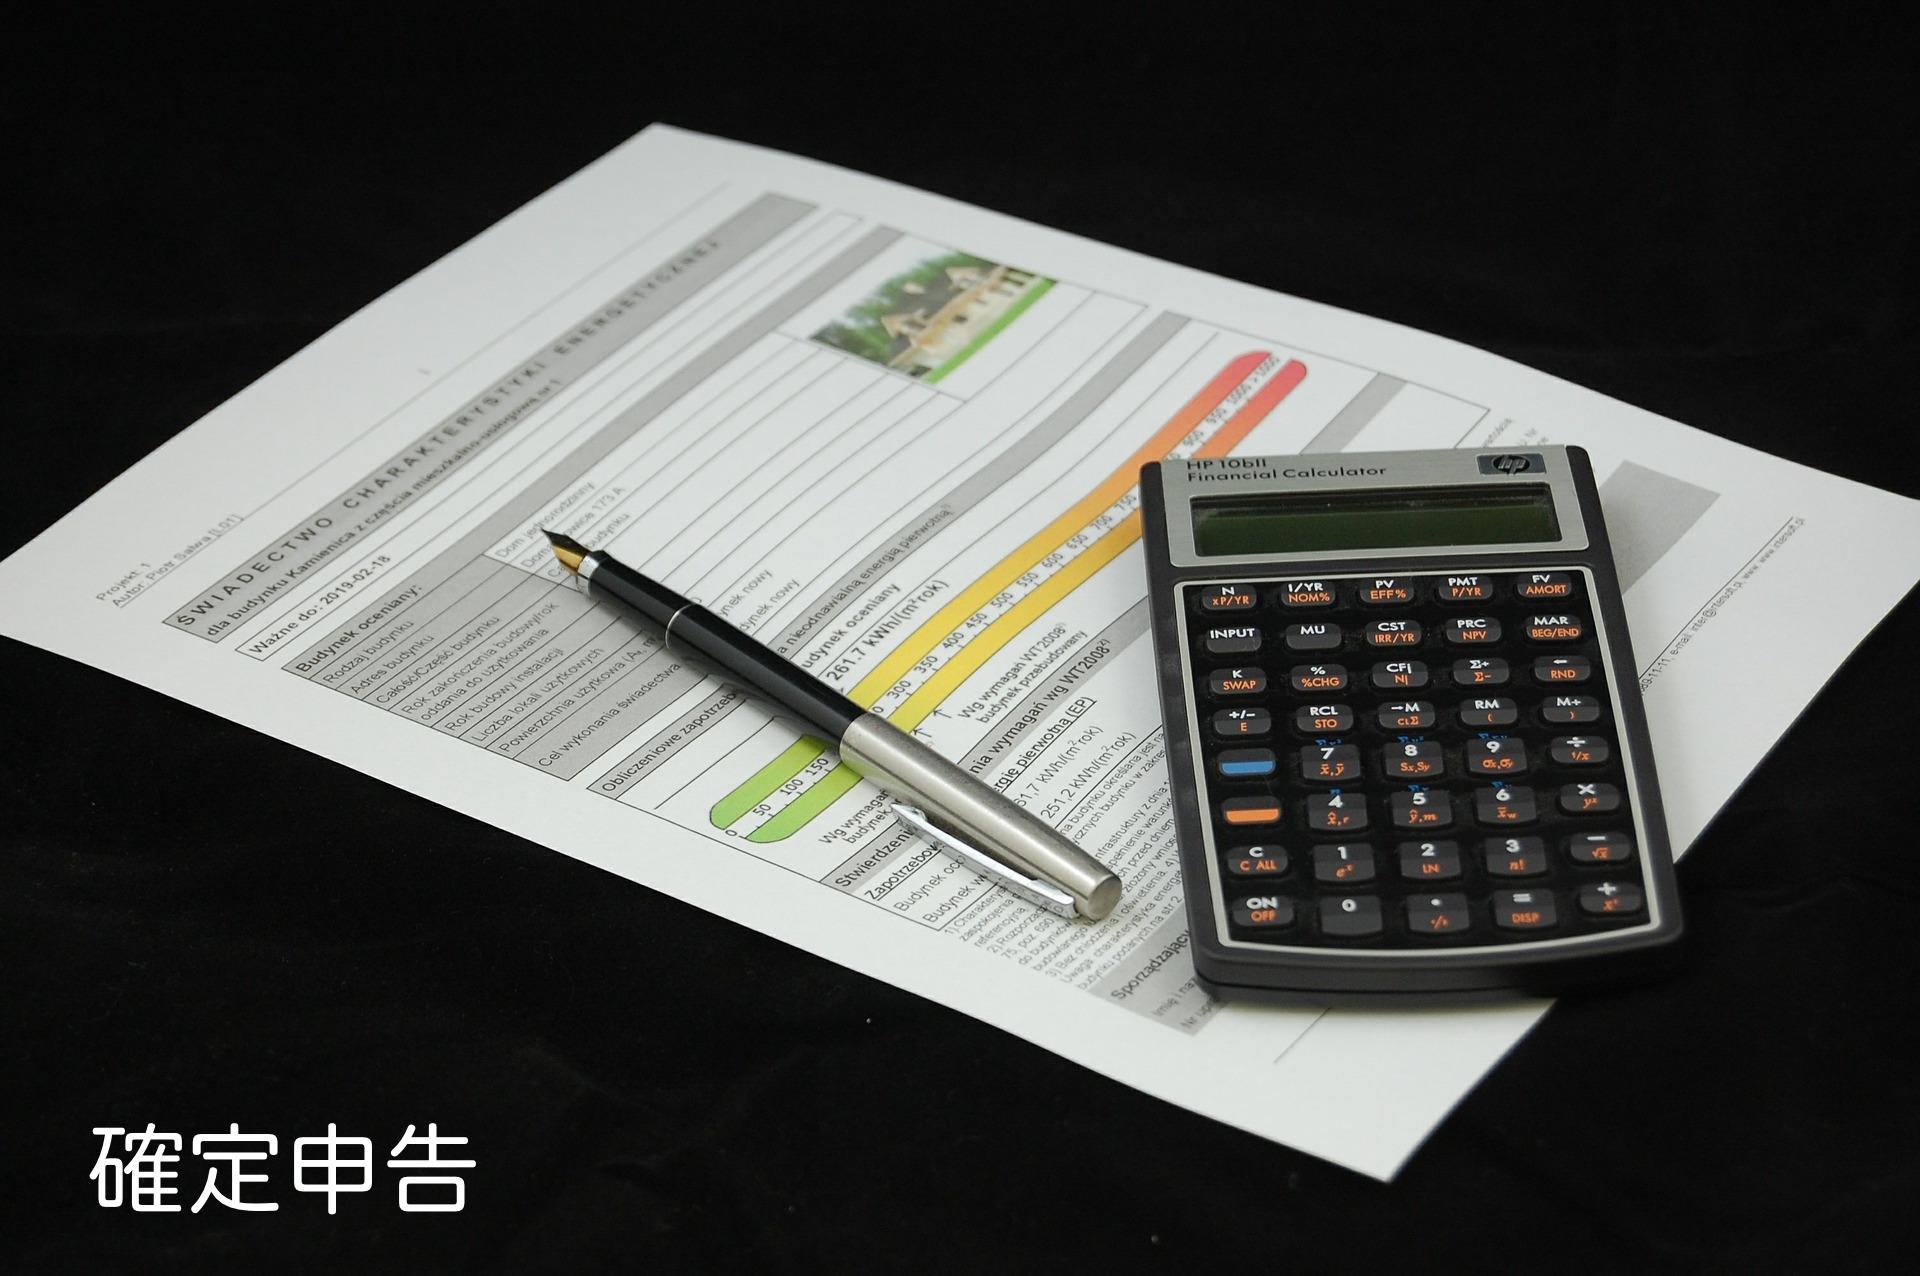 Calculator 428301 1920